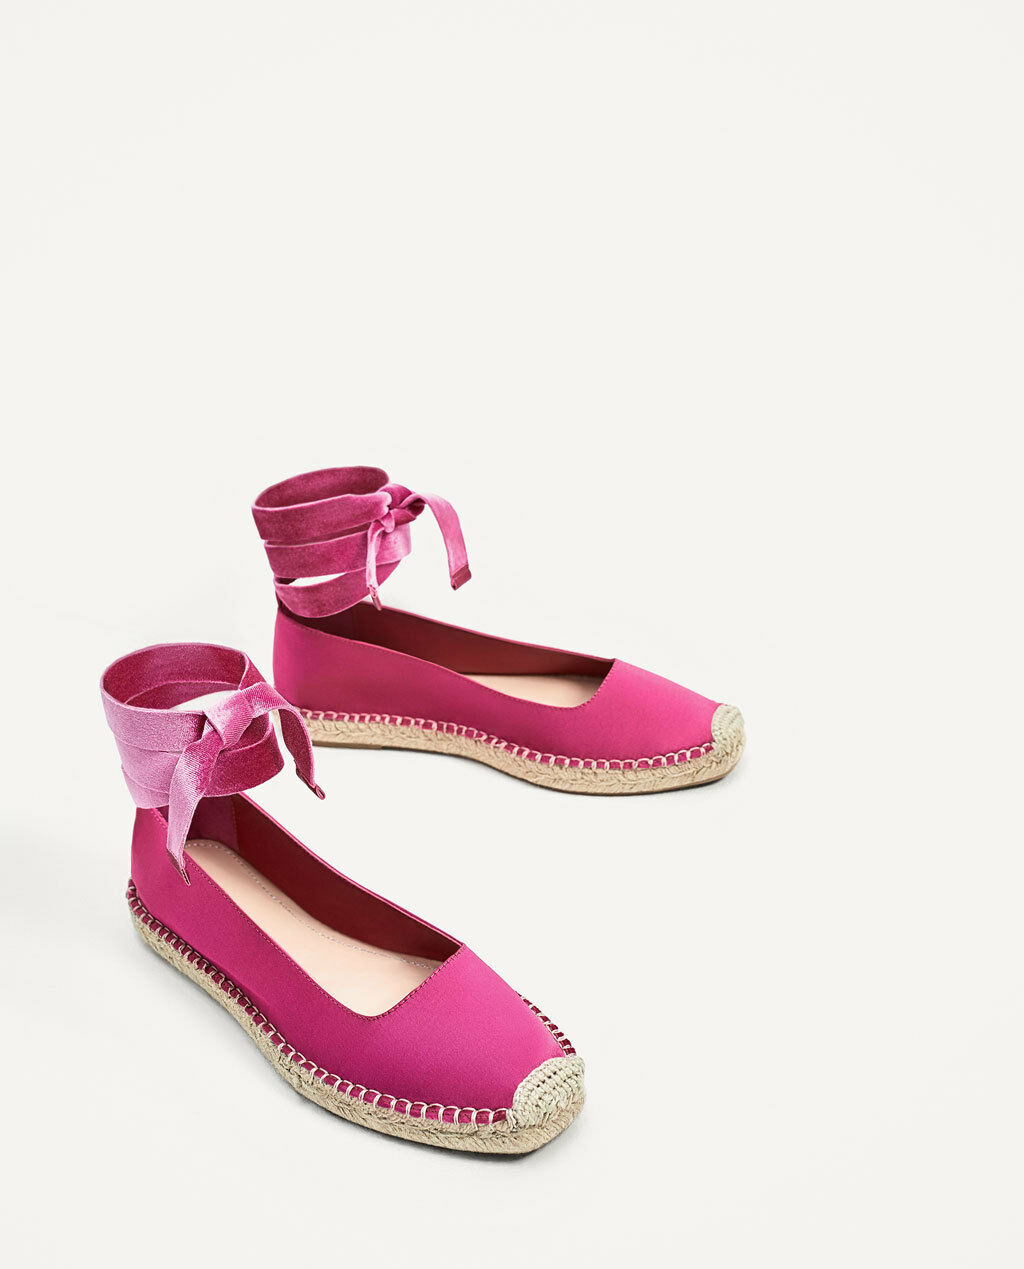 ZARA FUCHSIA SATIN TIED ESPADRILLES FLAT Schuhe SIZE UK4 EUR37 US6.5 NEW